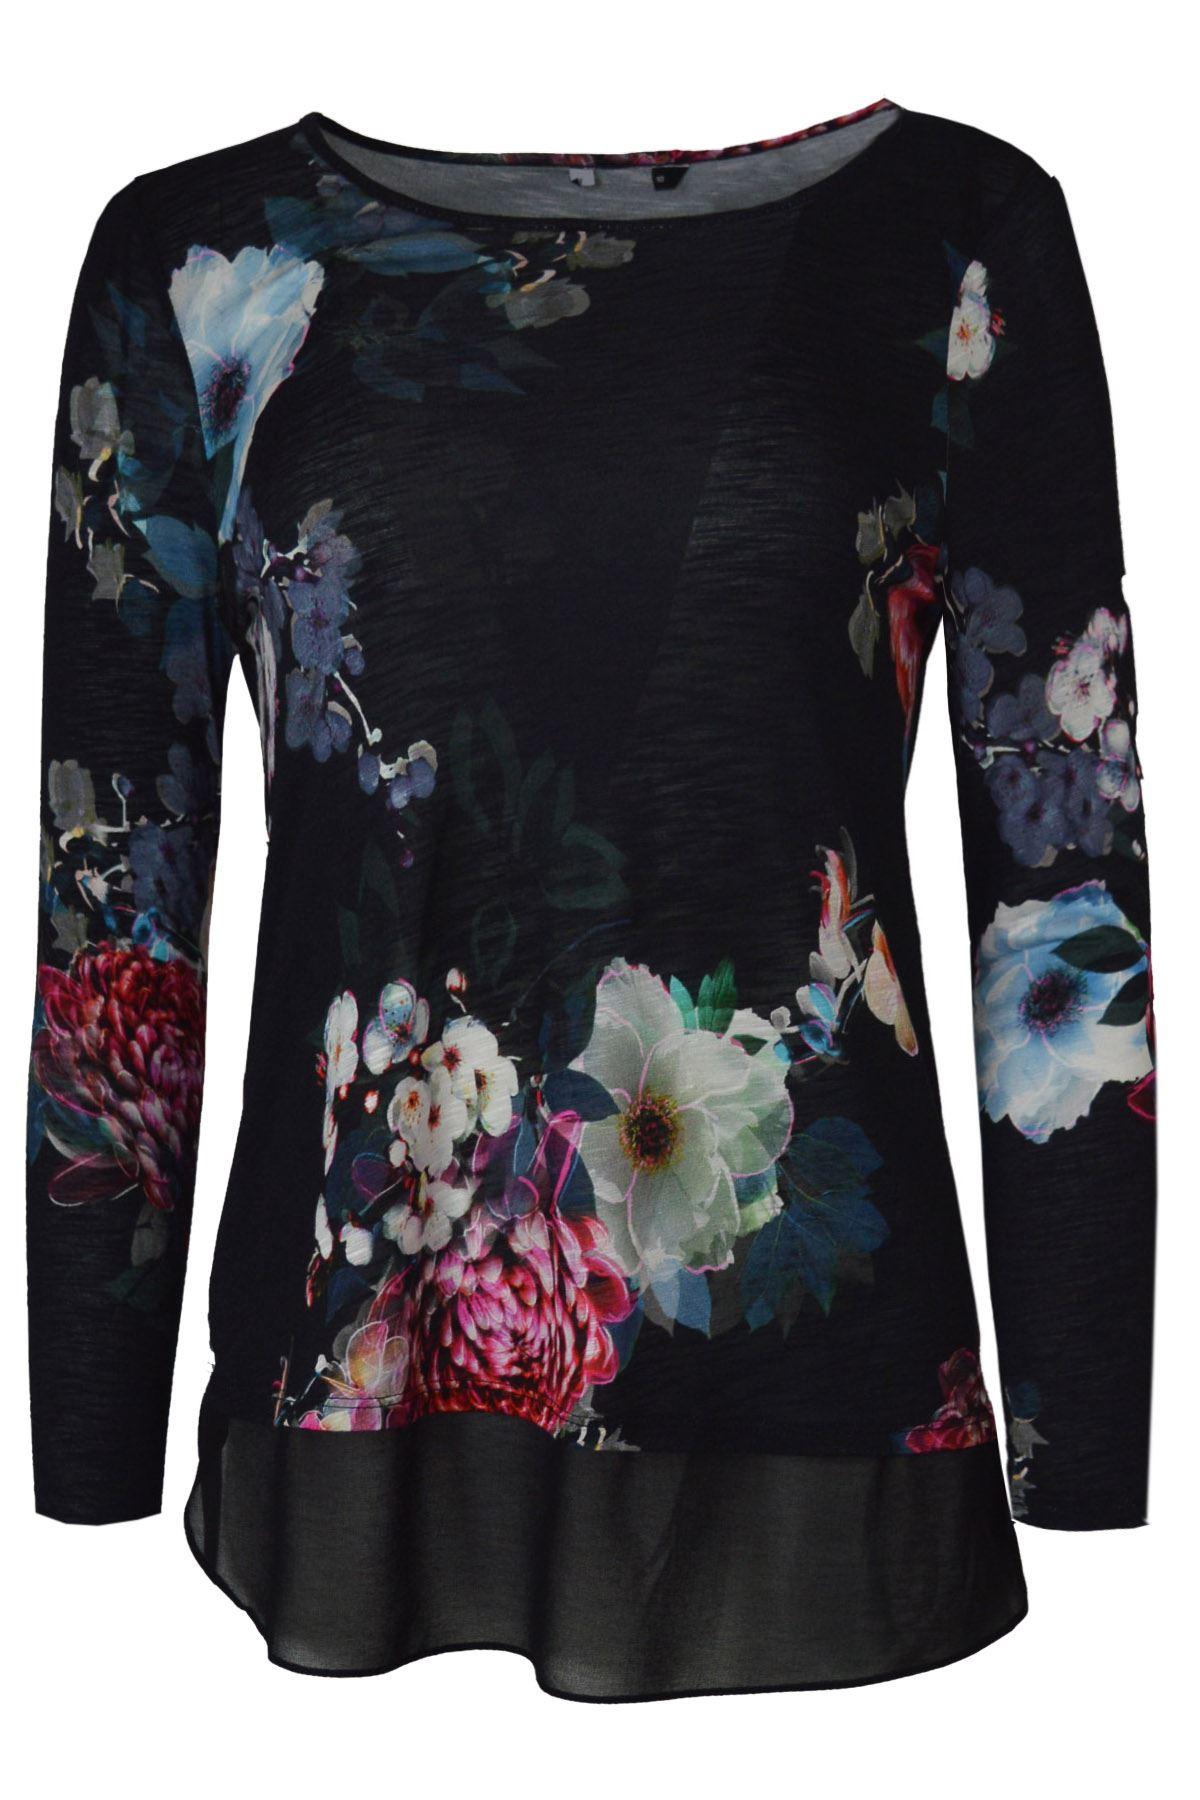 ROMAN-ORIGINALS-Black-Floral-Jersey-Top-with-Chiffon-Mock-Layer-RRP-30 thumbnail 4